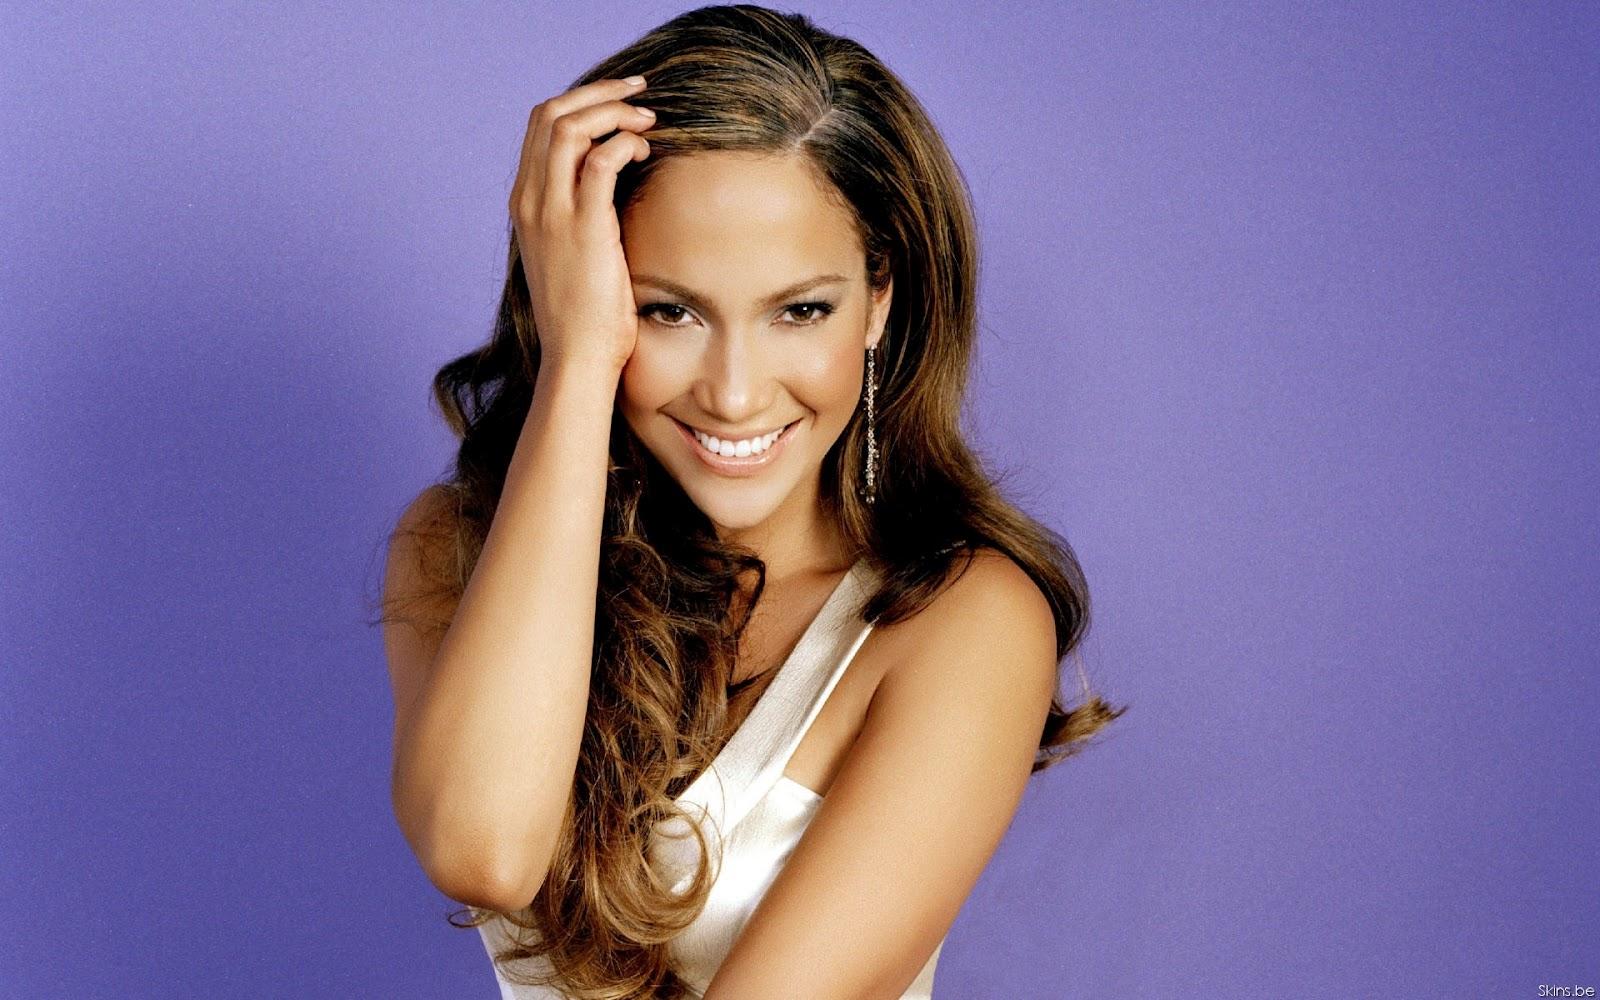 http://2.bp.blogspot.com/--332rePRE6k/T-2h_Sw3TZI/AAAAAAAADbQ/fs-m7uzdwAc/s1600/Jennifer+Lopez+hd+Wallpapers+2012_3.jpg